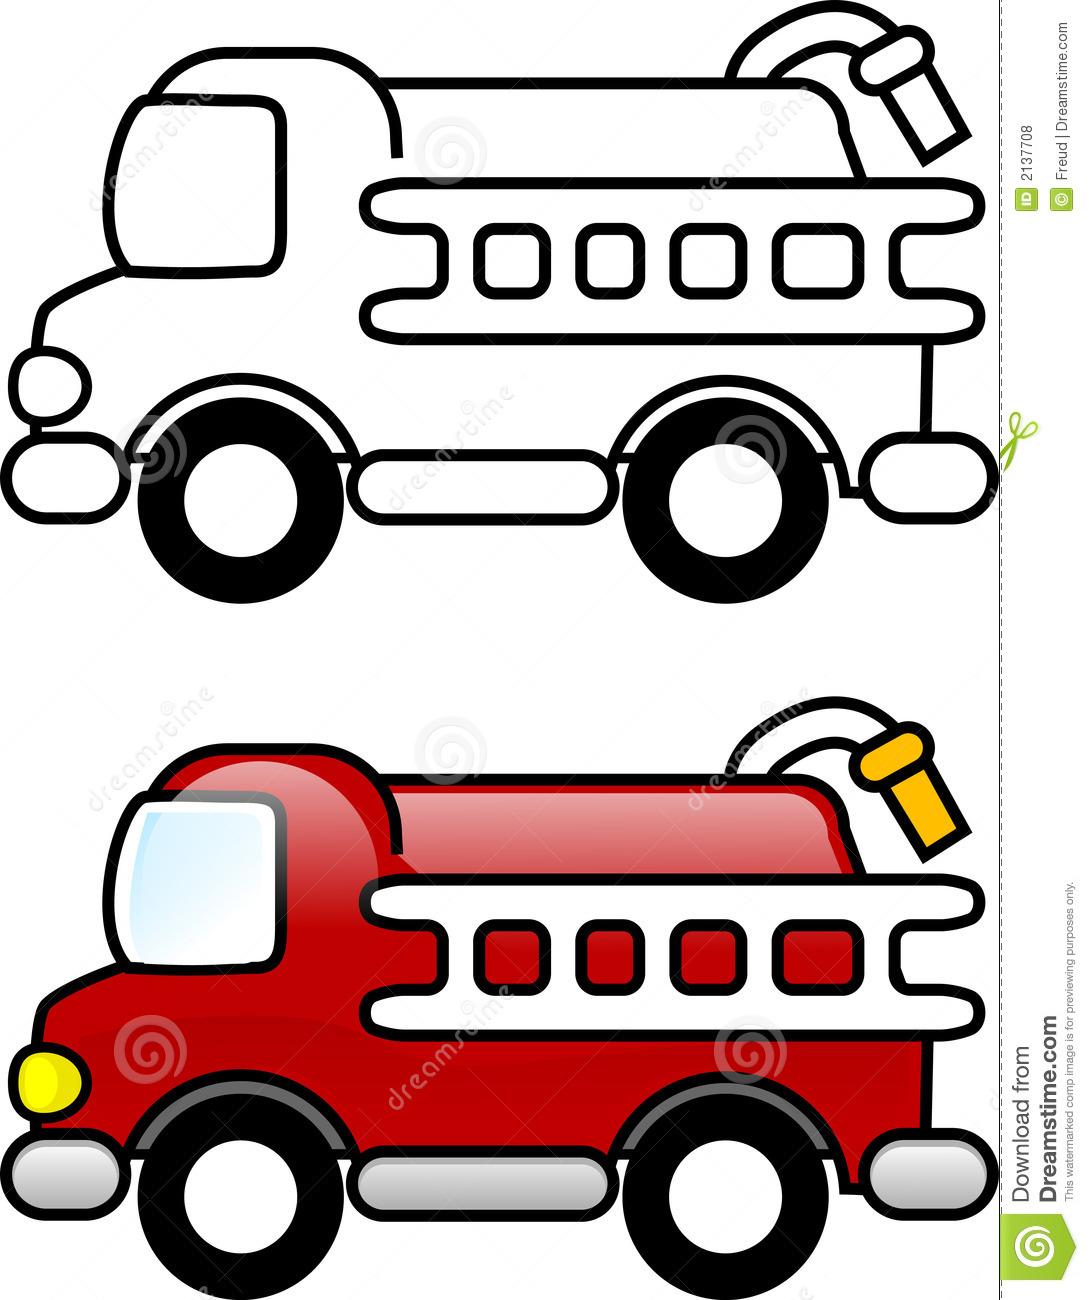 Free fire truck download. Firetruck clipart simple